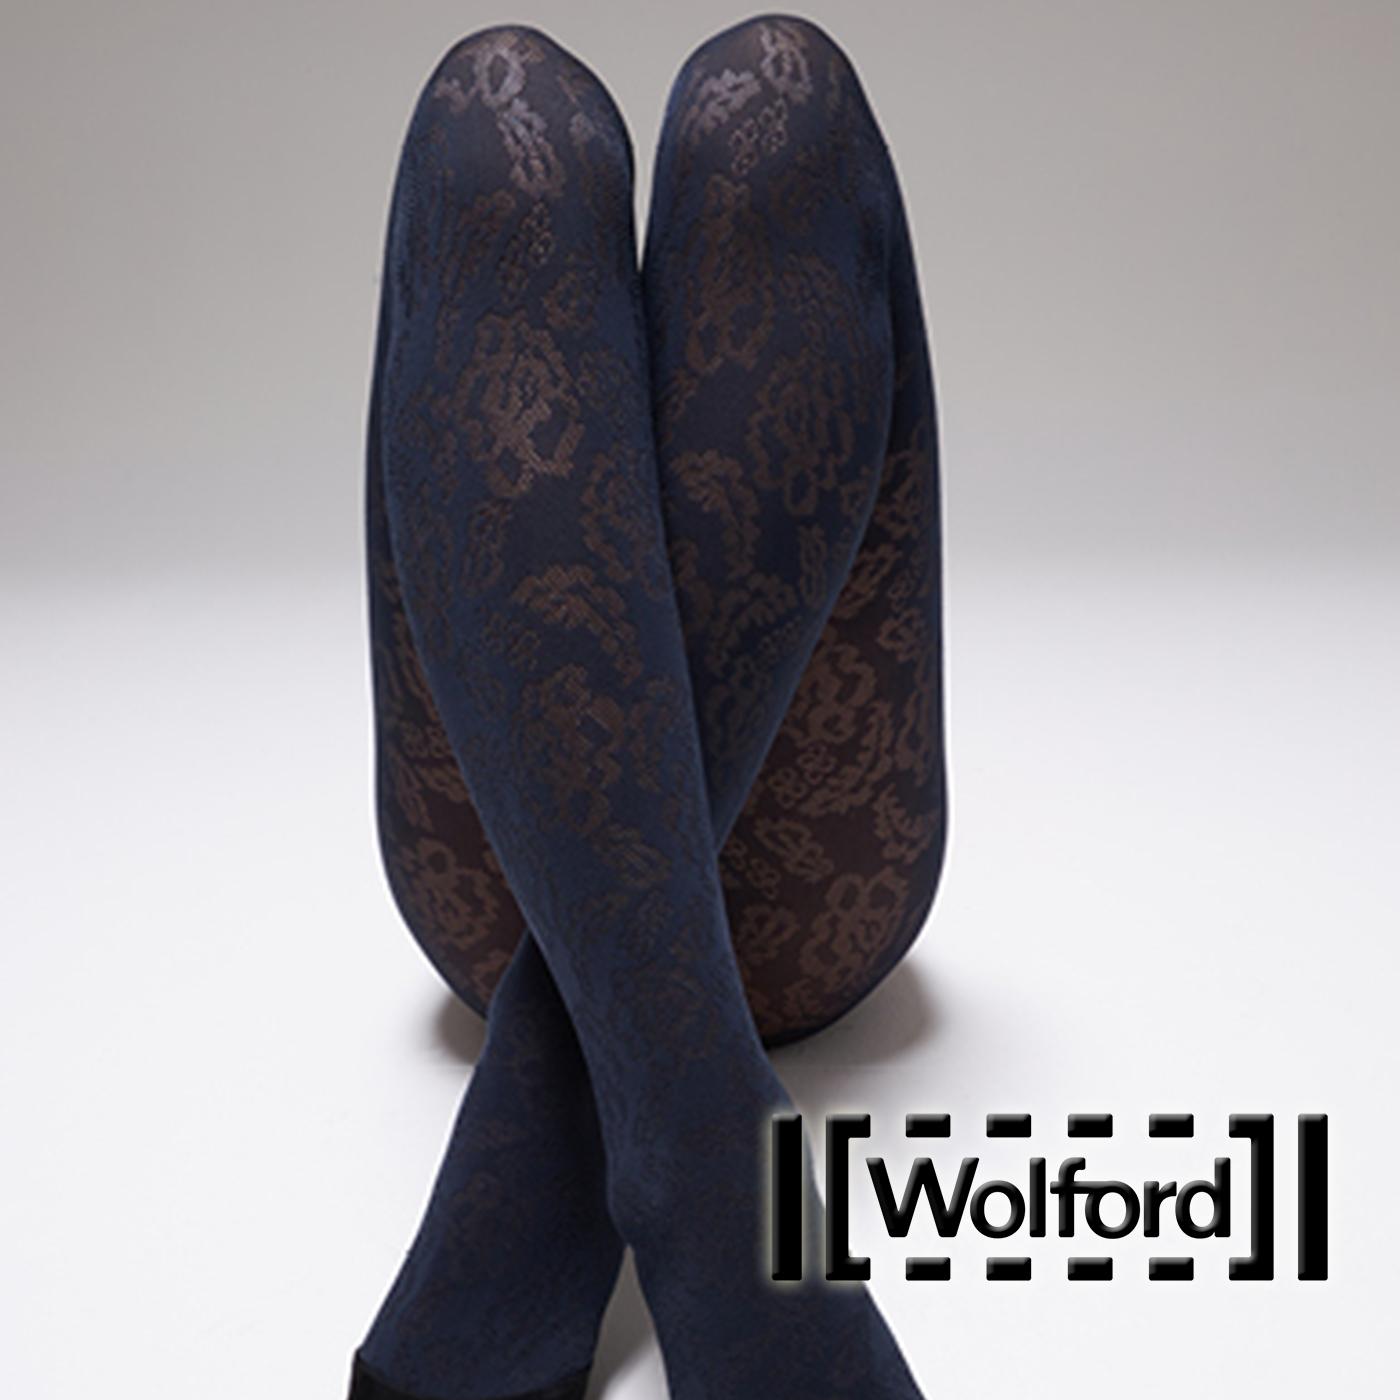 Merken Wolford